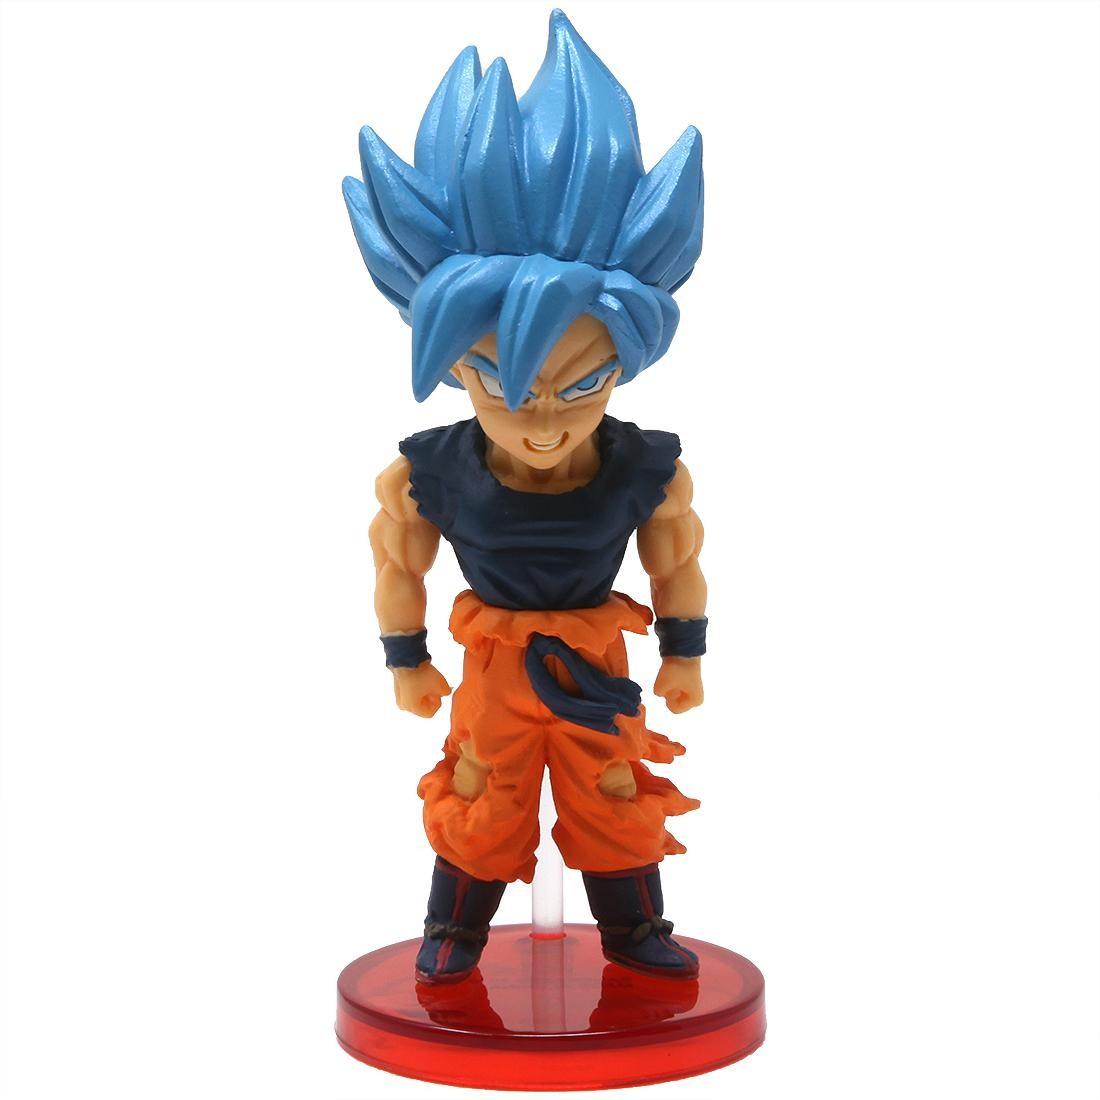 Banpresto Dragon Ball Super Movie World Collectable Figure Vol. 2 - 07 Super Saiyan Blue Goku (blue)